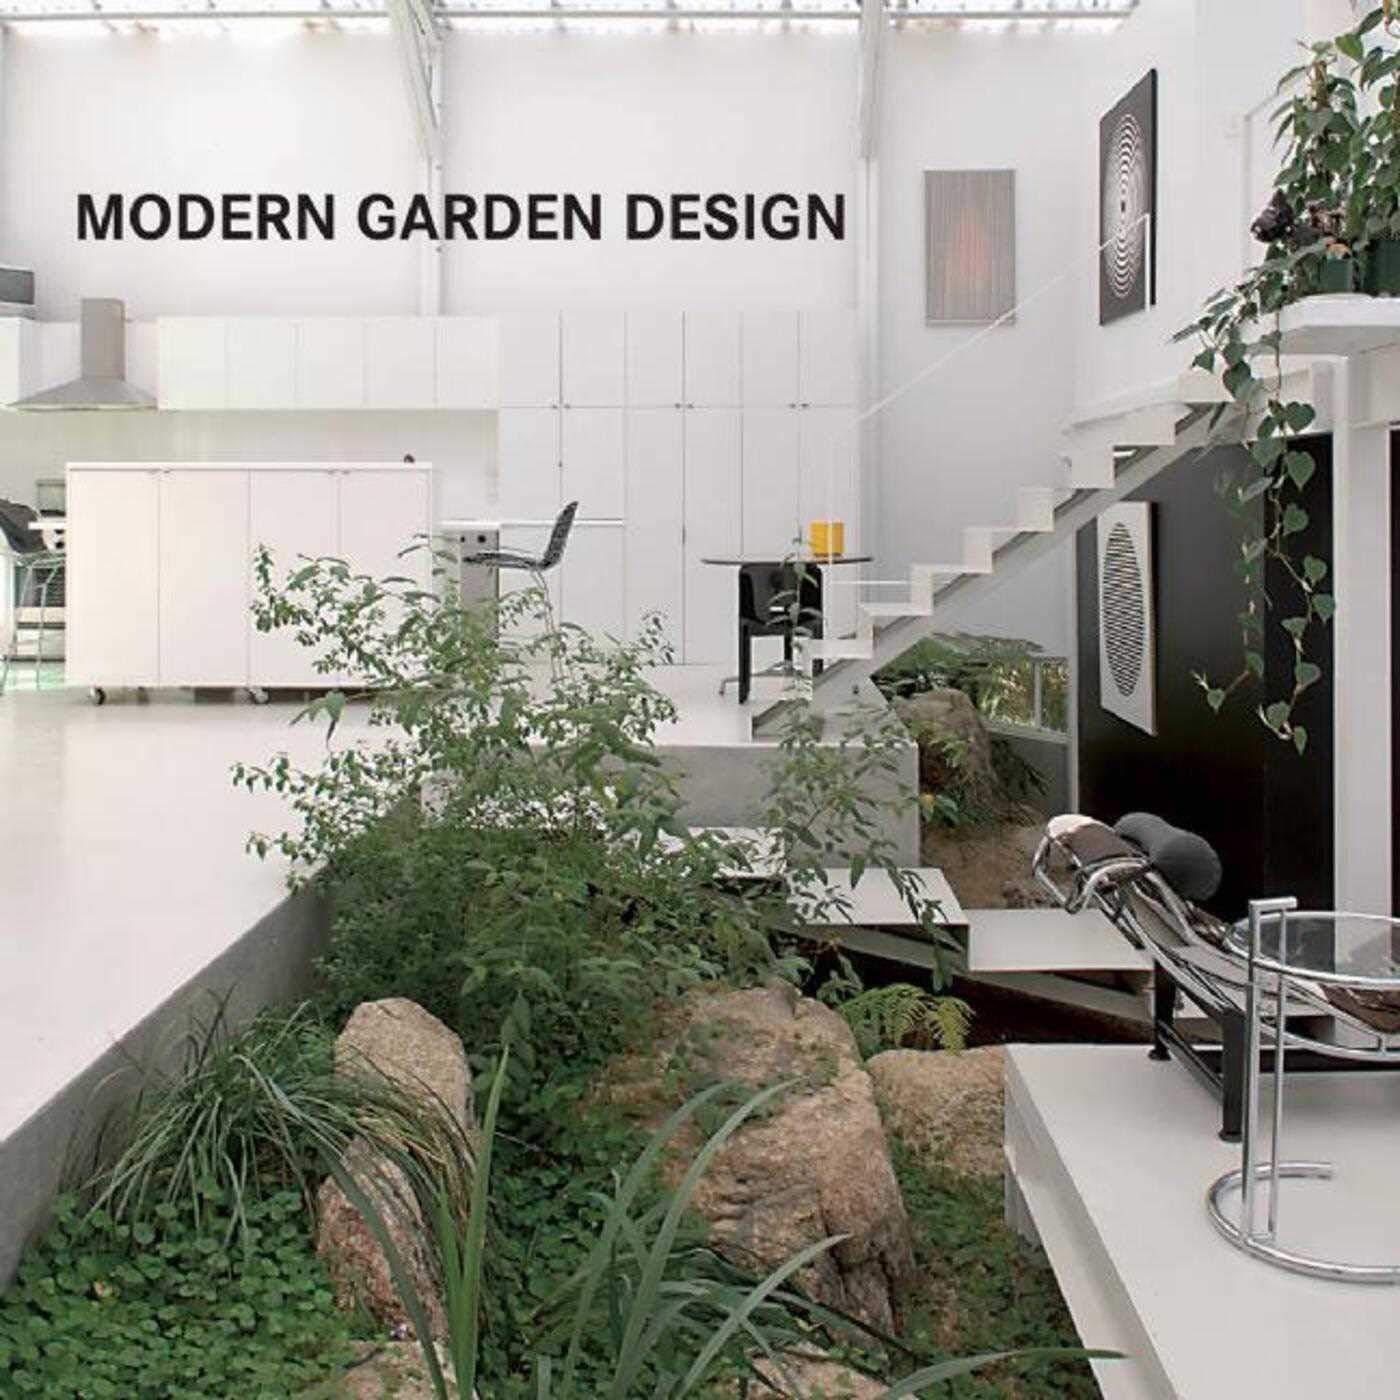 Modern Garden Design Loft Publications 9781632205940 Amazon Com